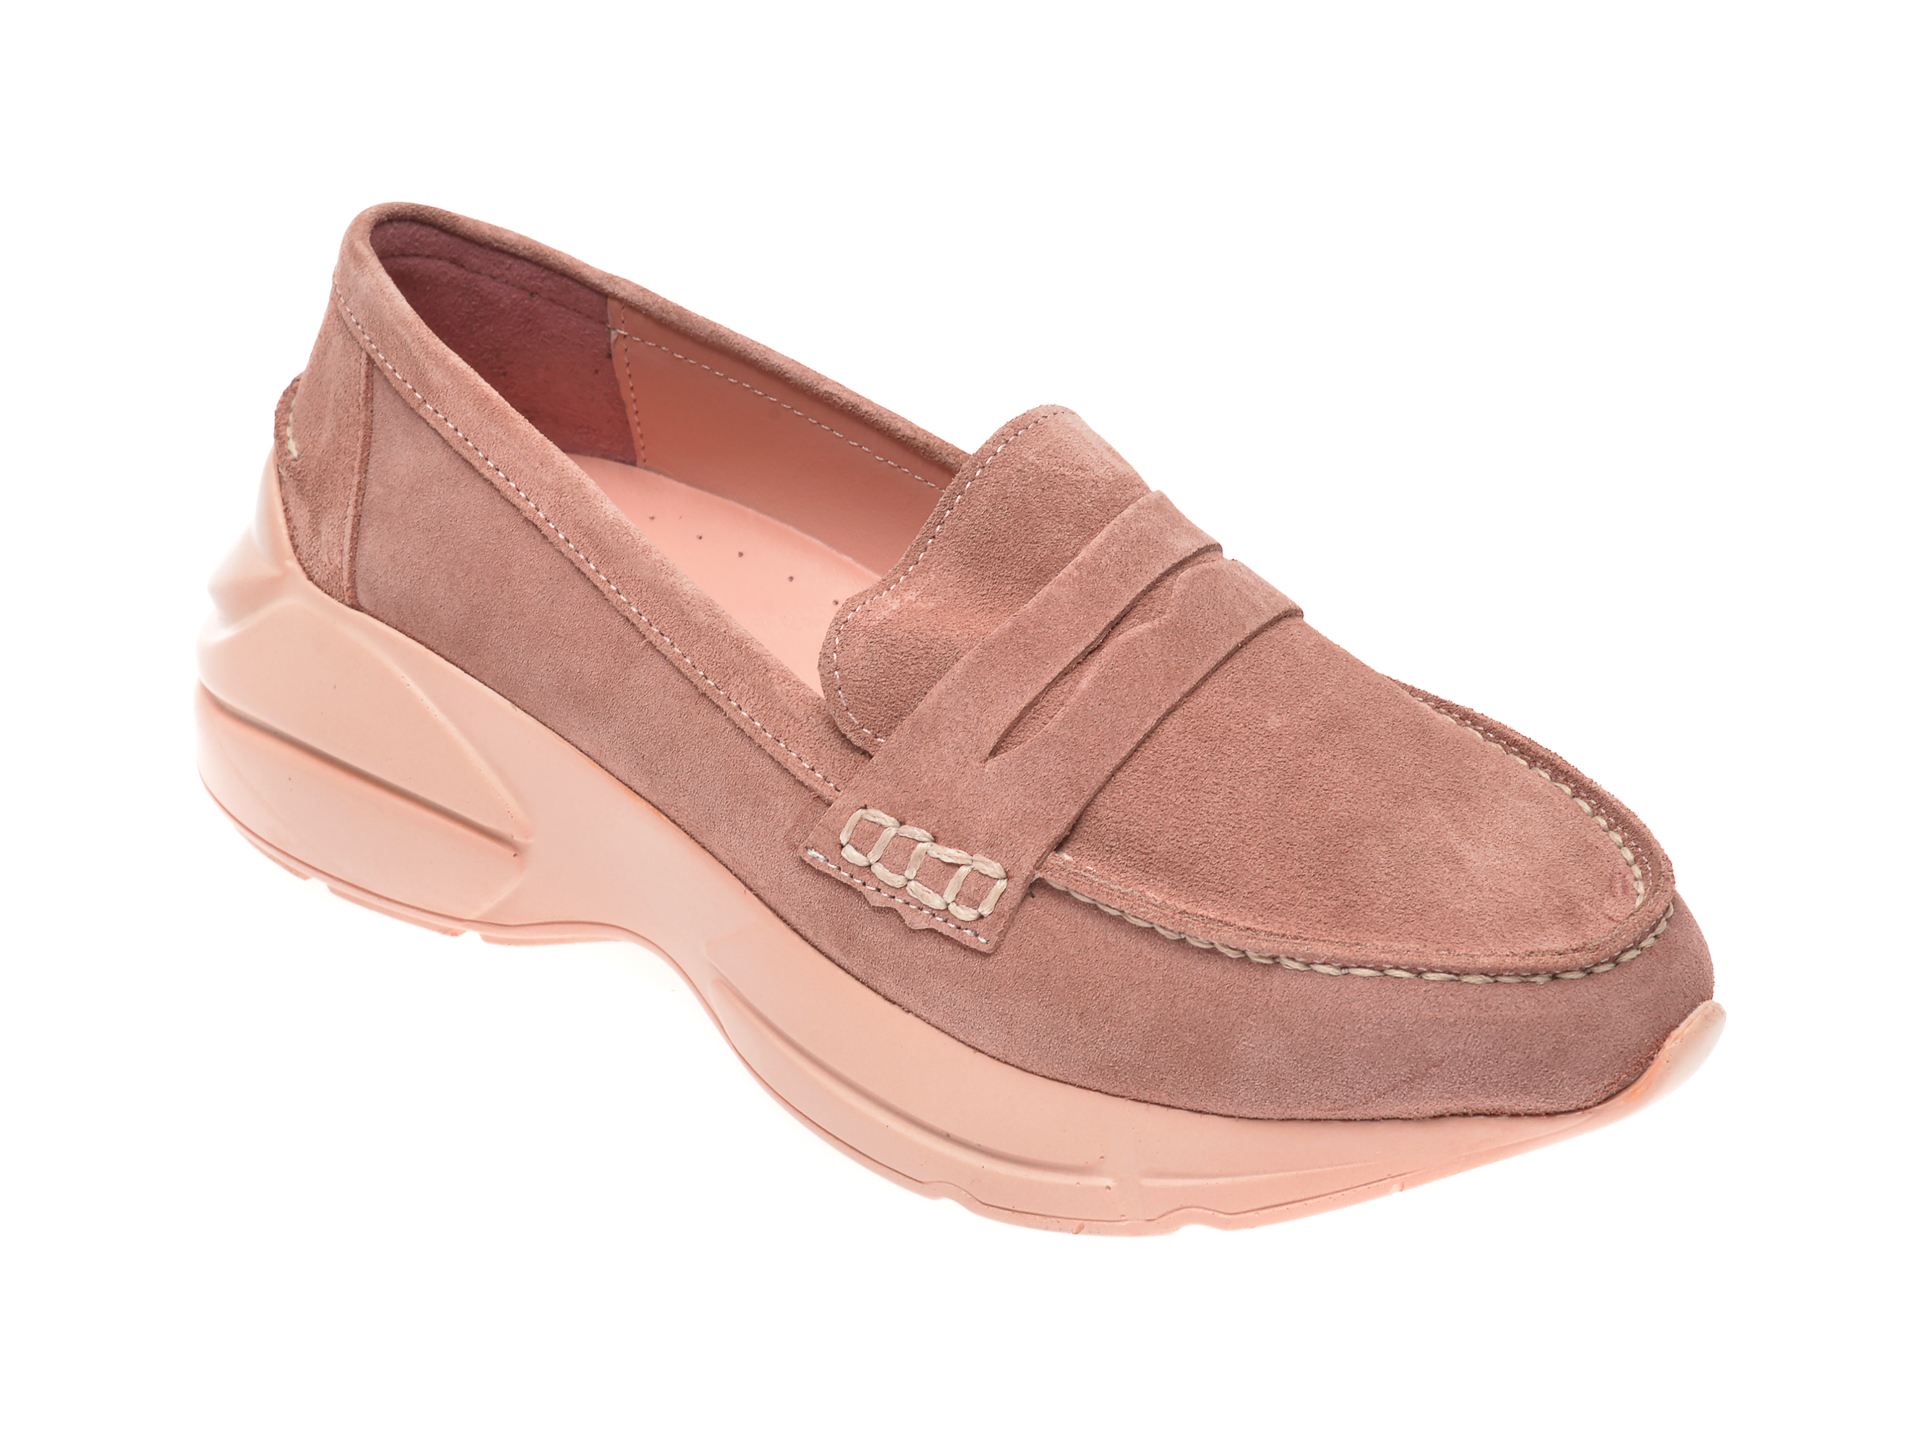 Pantofi FLAVIA PASSINI roz, 402951, din piele intoarsa